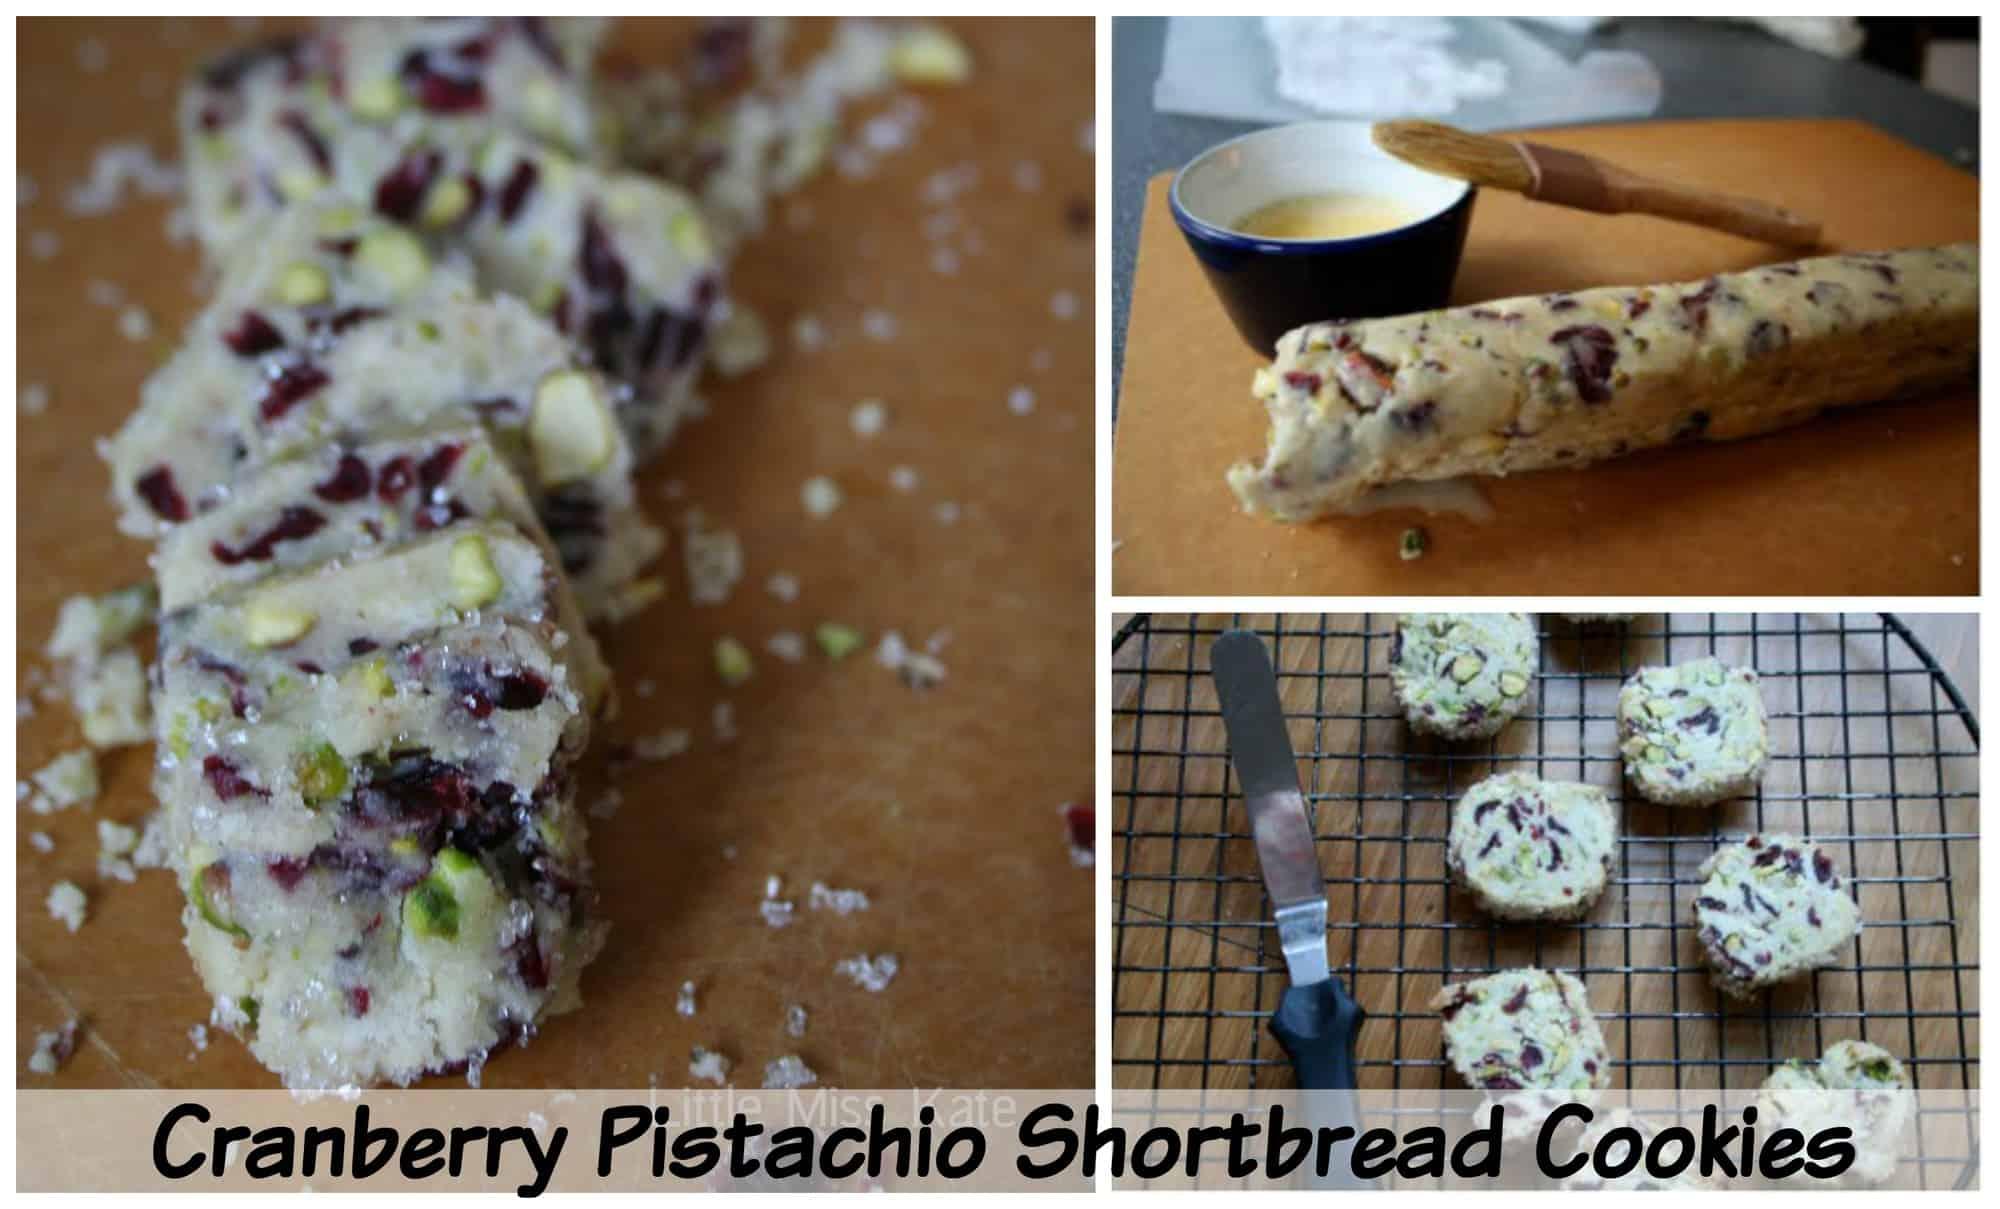 Cranberry Pistachio Shortbread Cookies Recipe